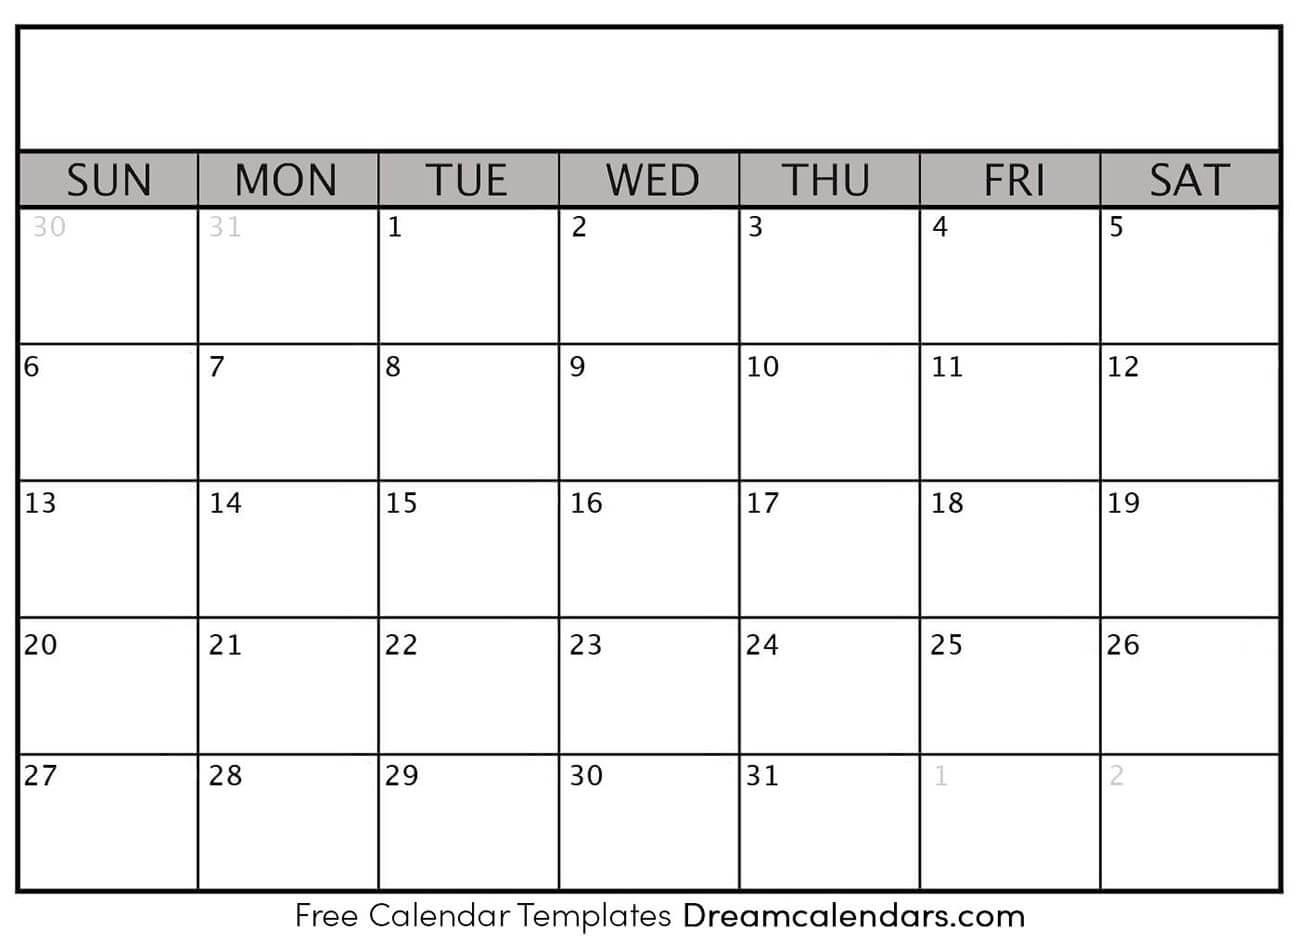 Pick Blank Calendar To Fill In